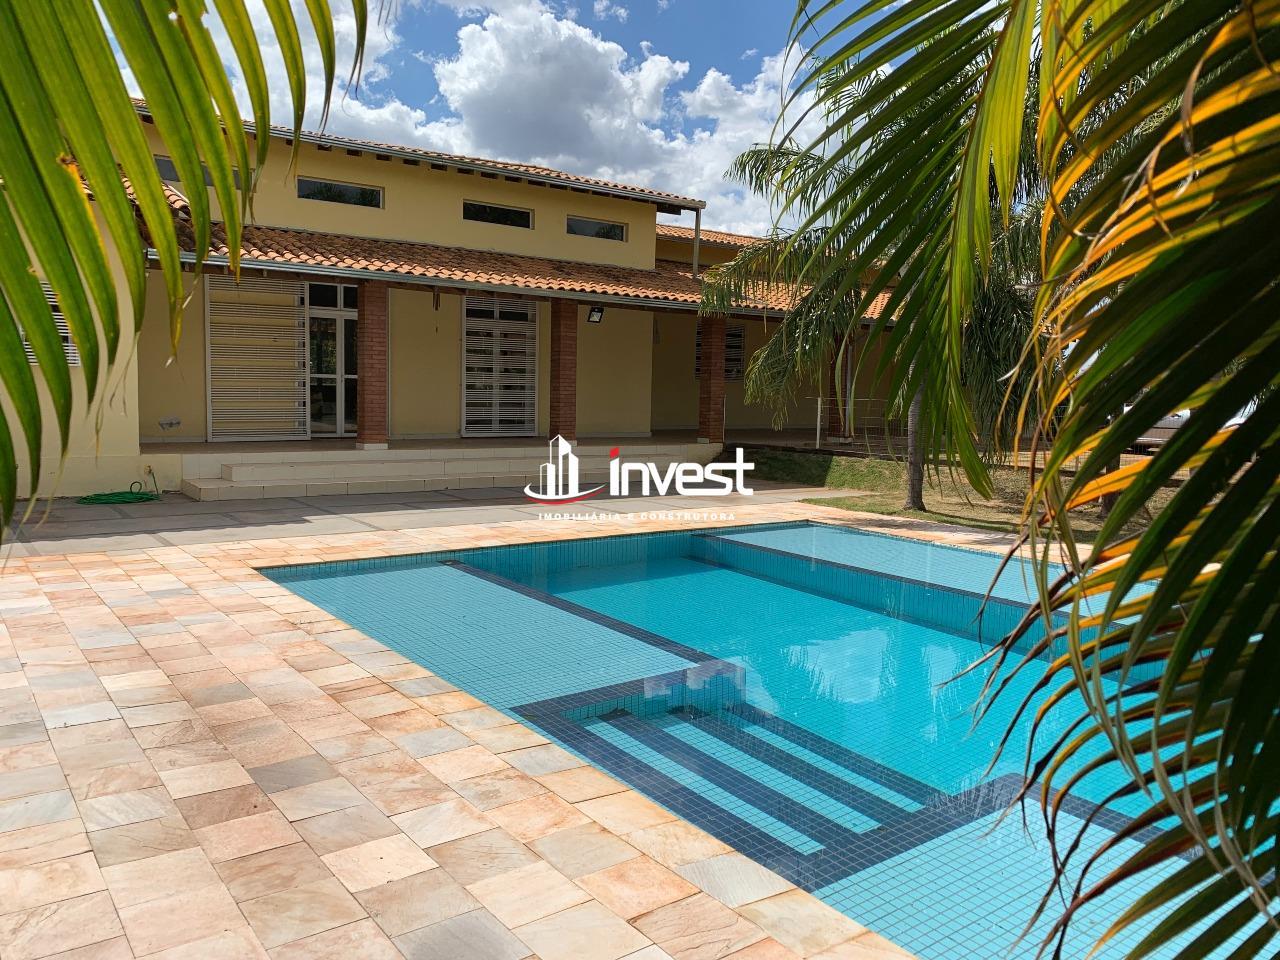 Casa Condomínio para aluguel, 7 quartos, Jockey Park - Uberaba/MG